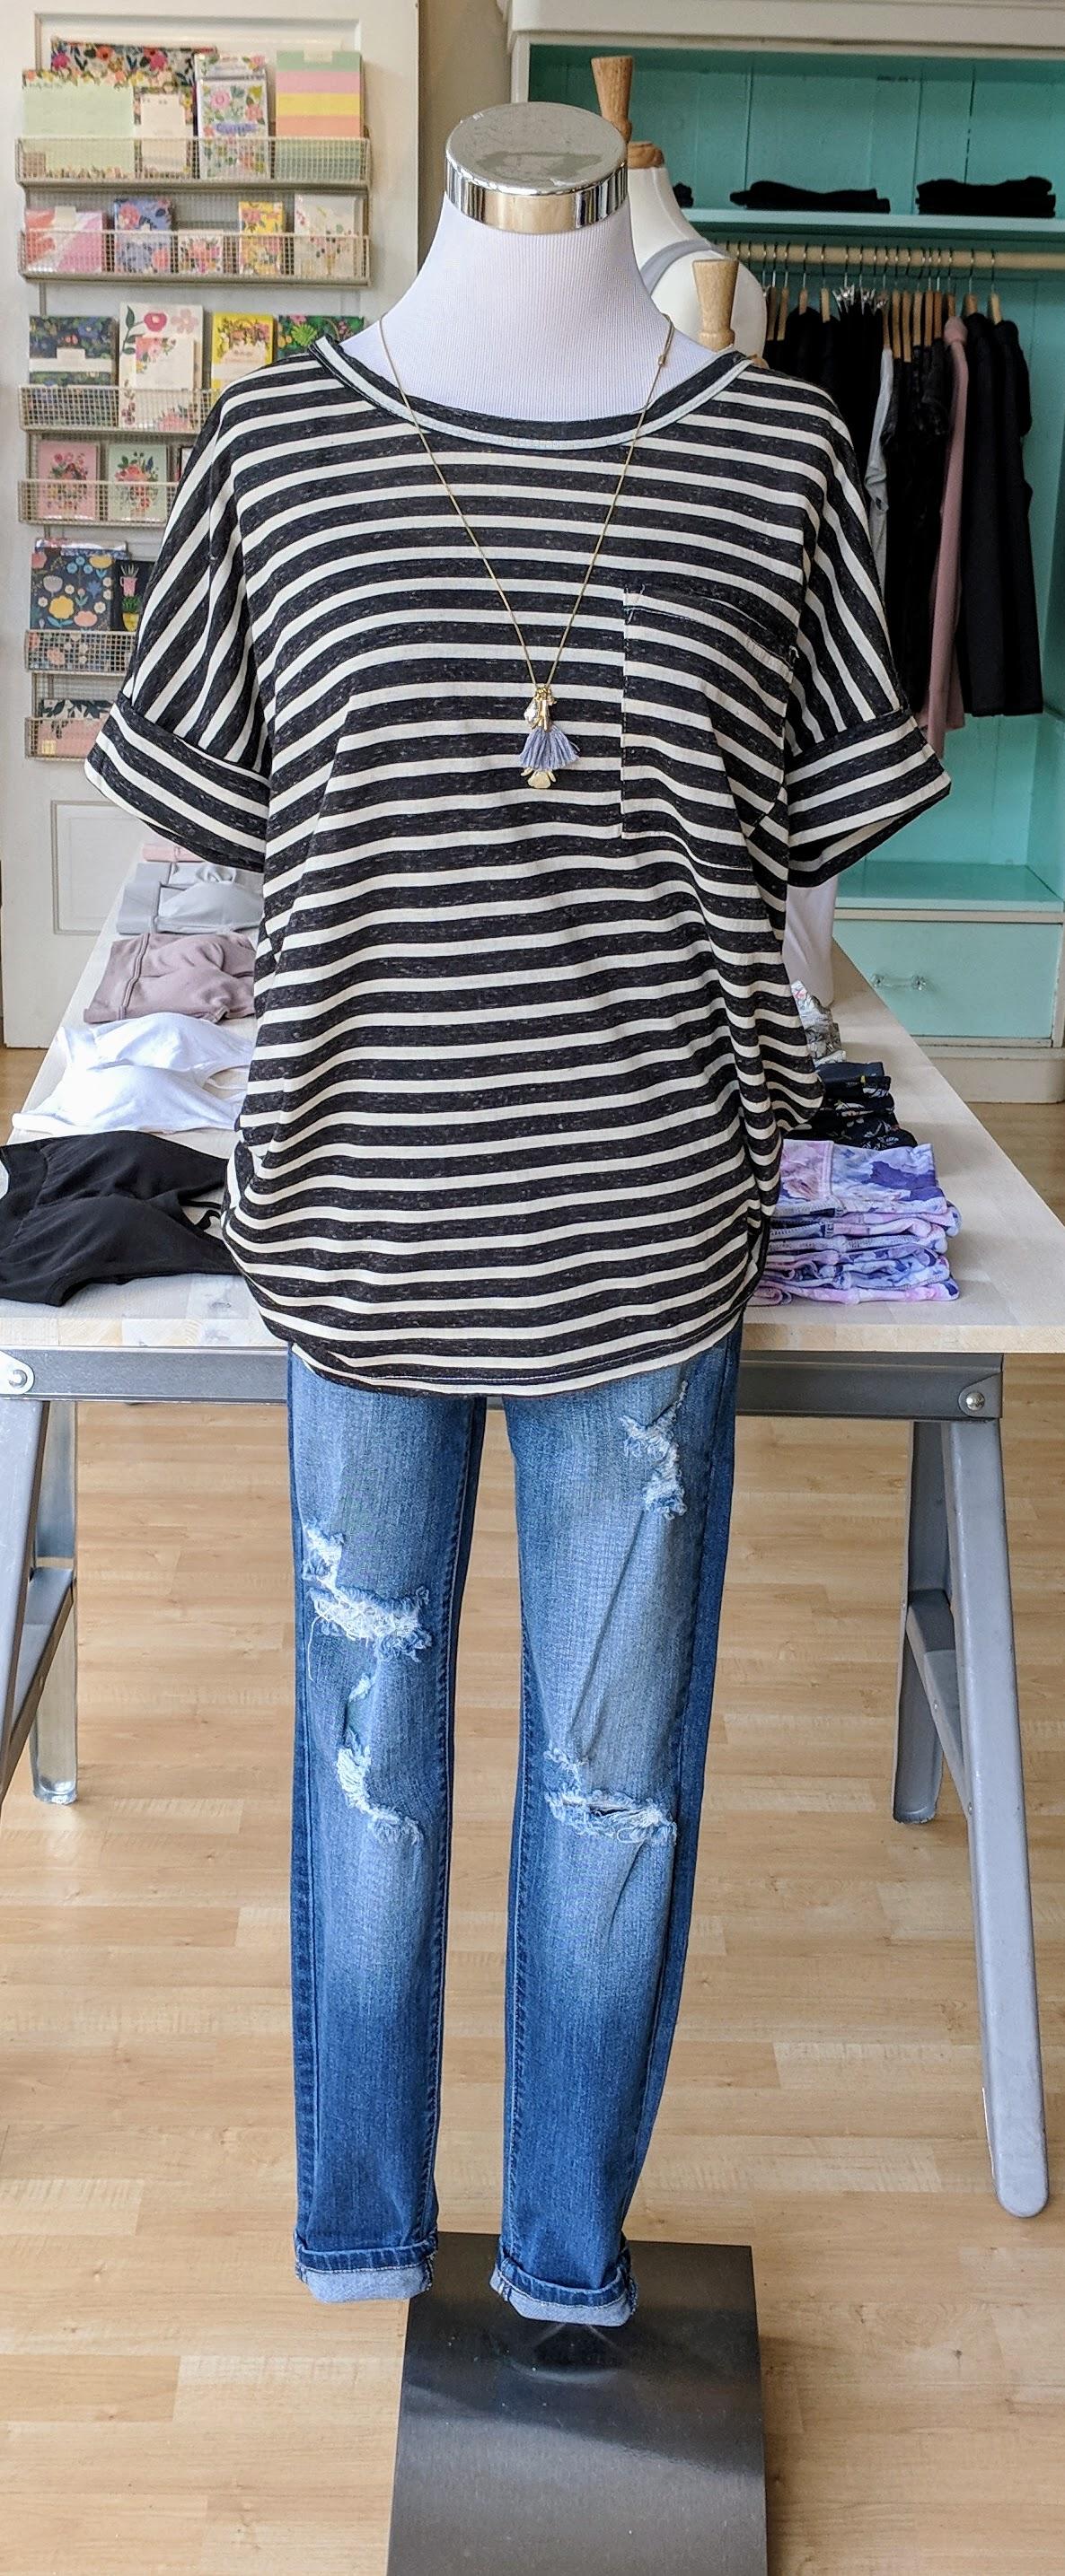 Basic Striped top w/ Chest Pocket, Black